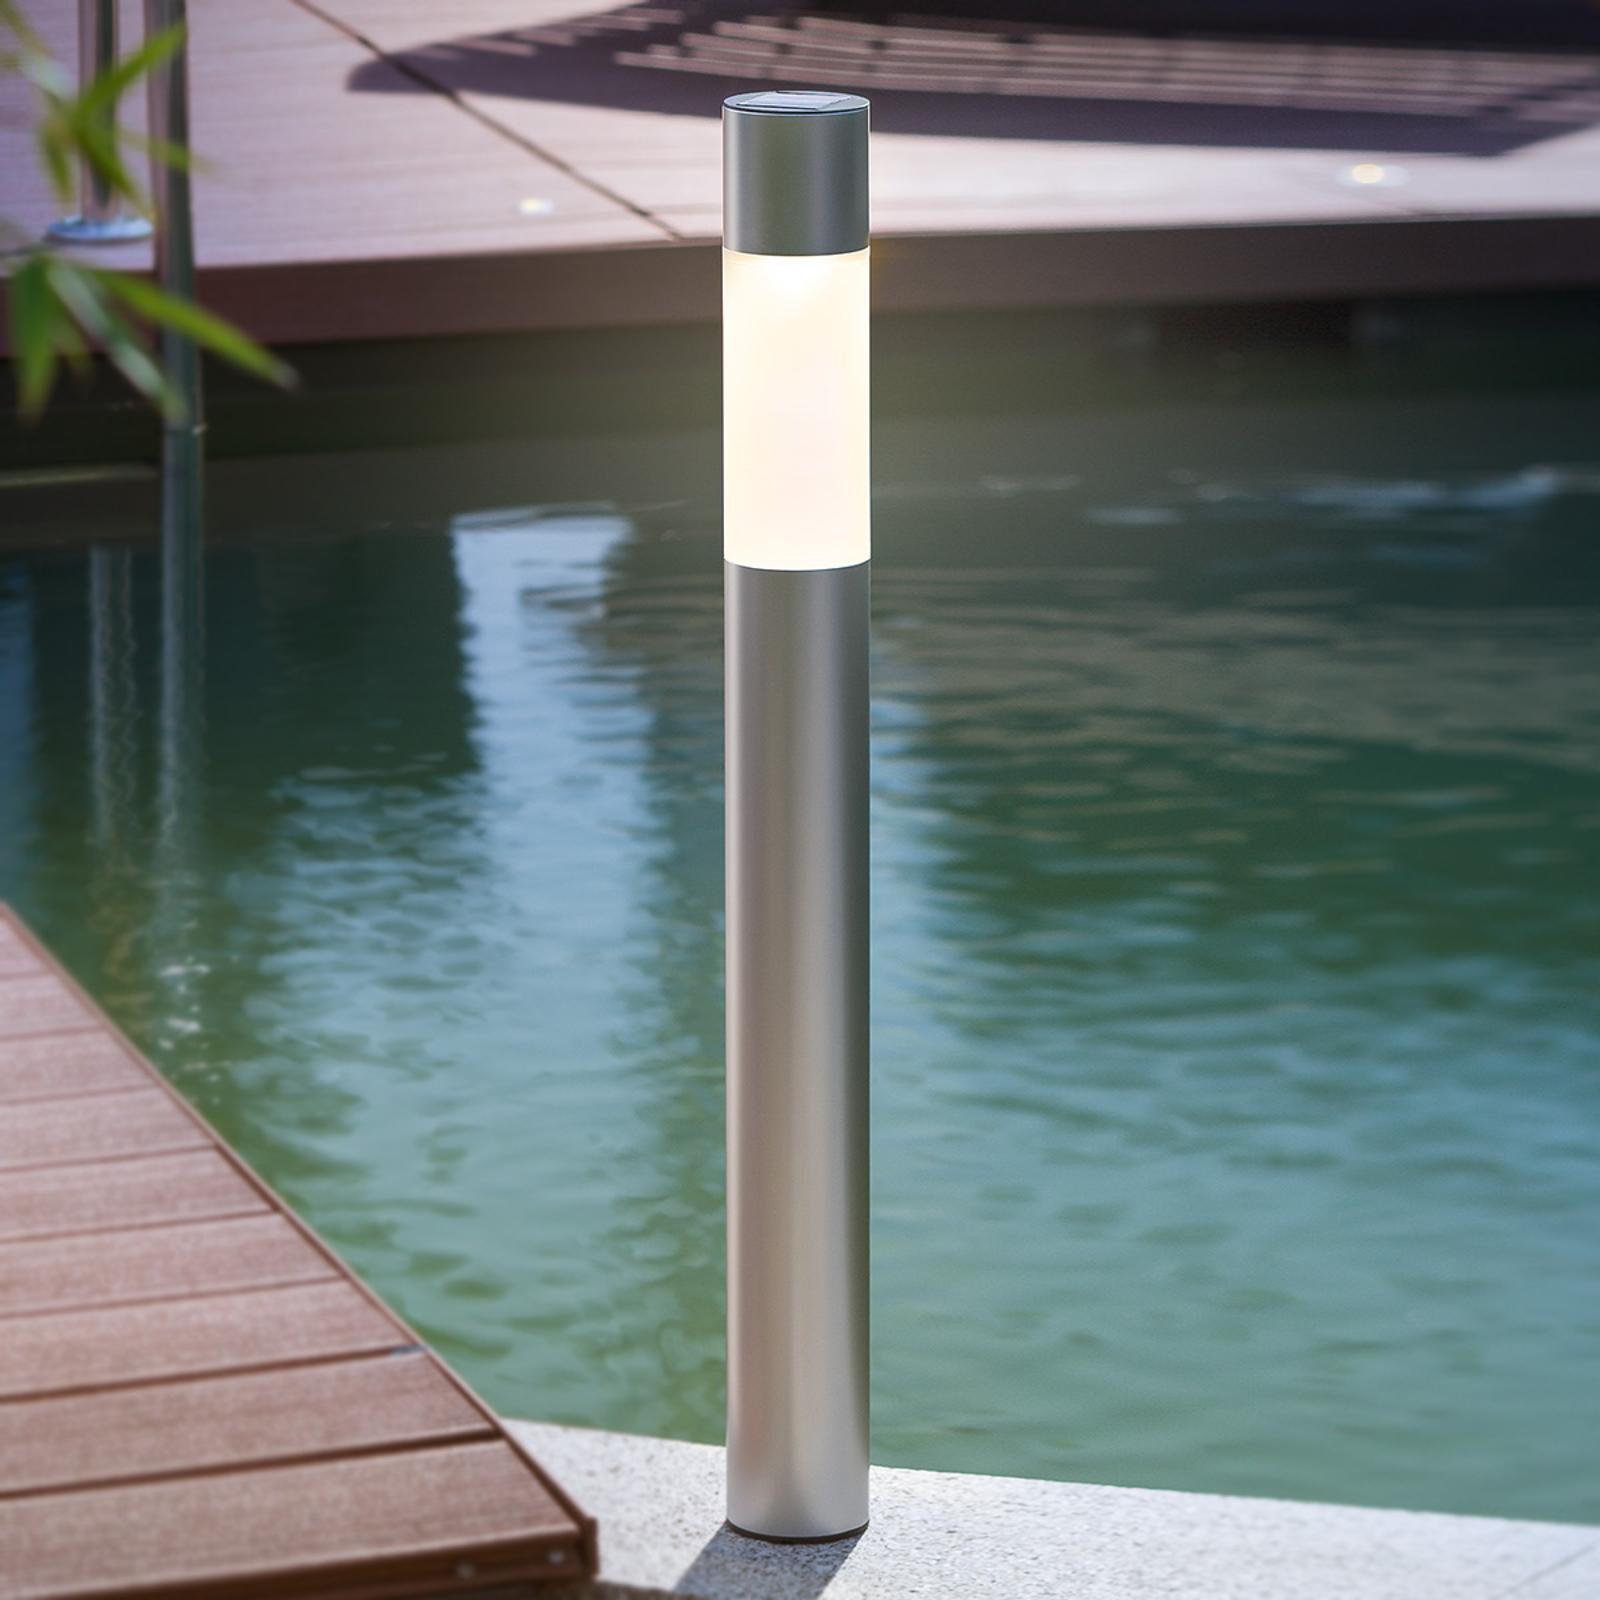 Nowoczesna lampa solarna LED Pole Light